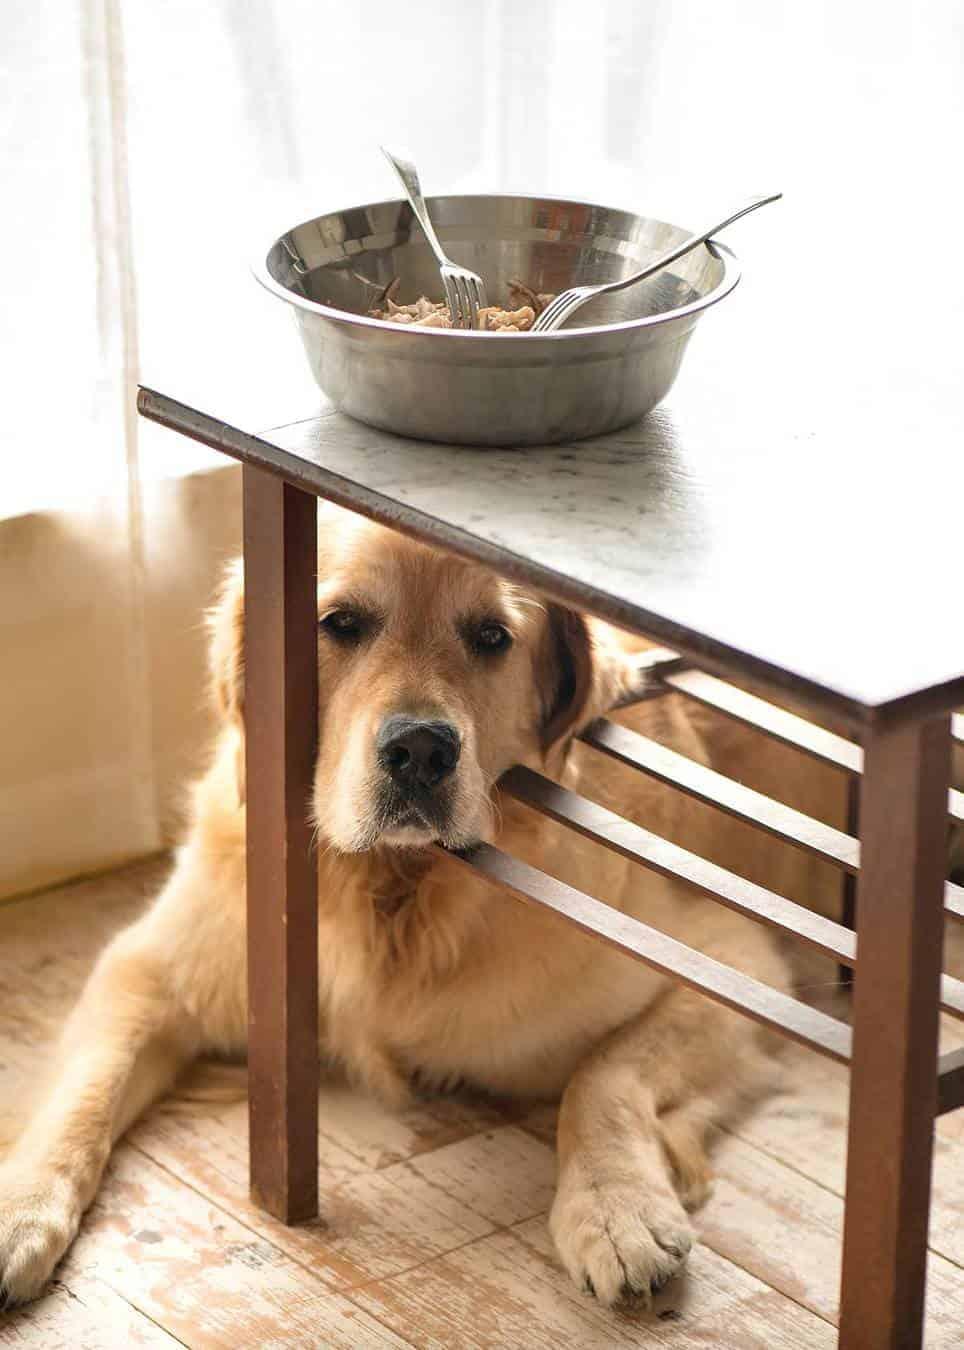 Dozer the golden retriever sitting under a bowl of shredded chicken